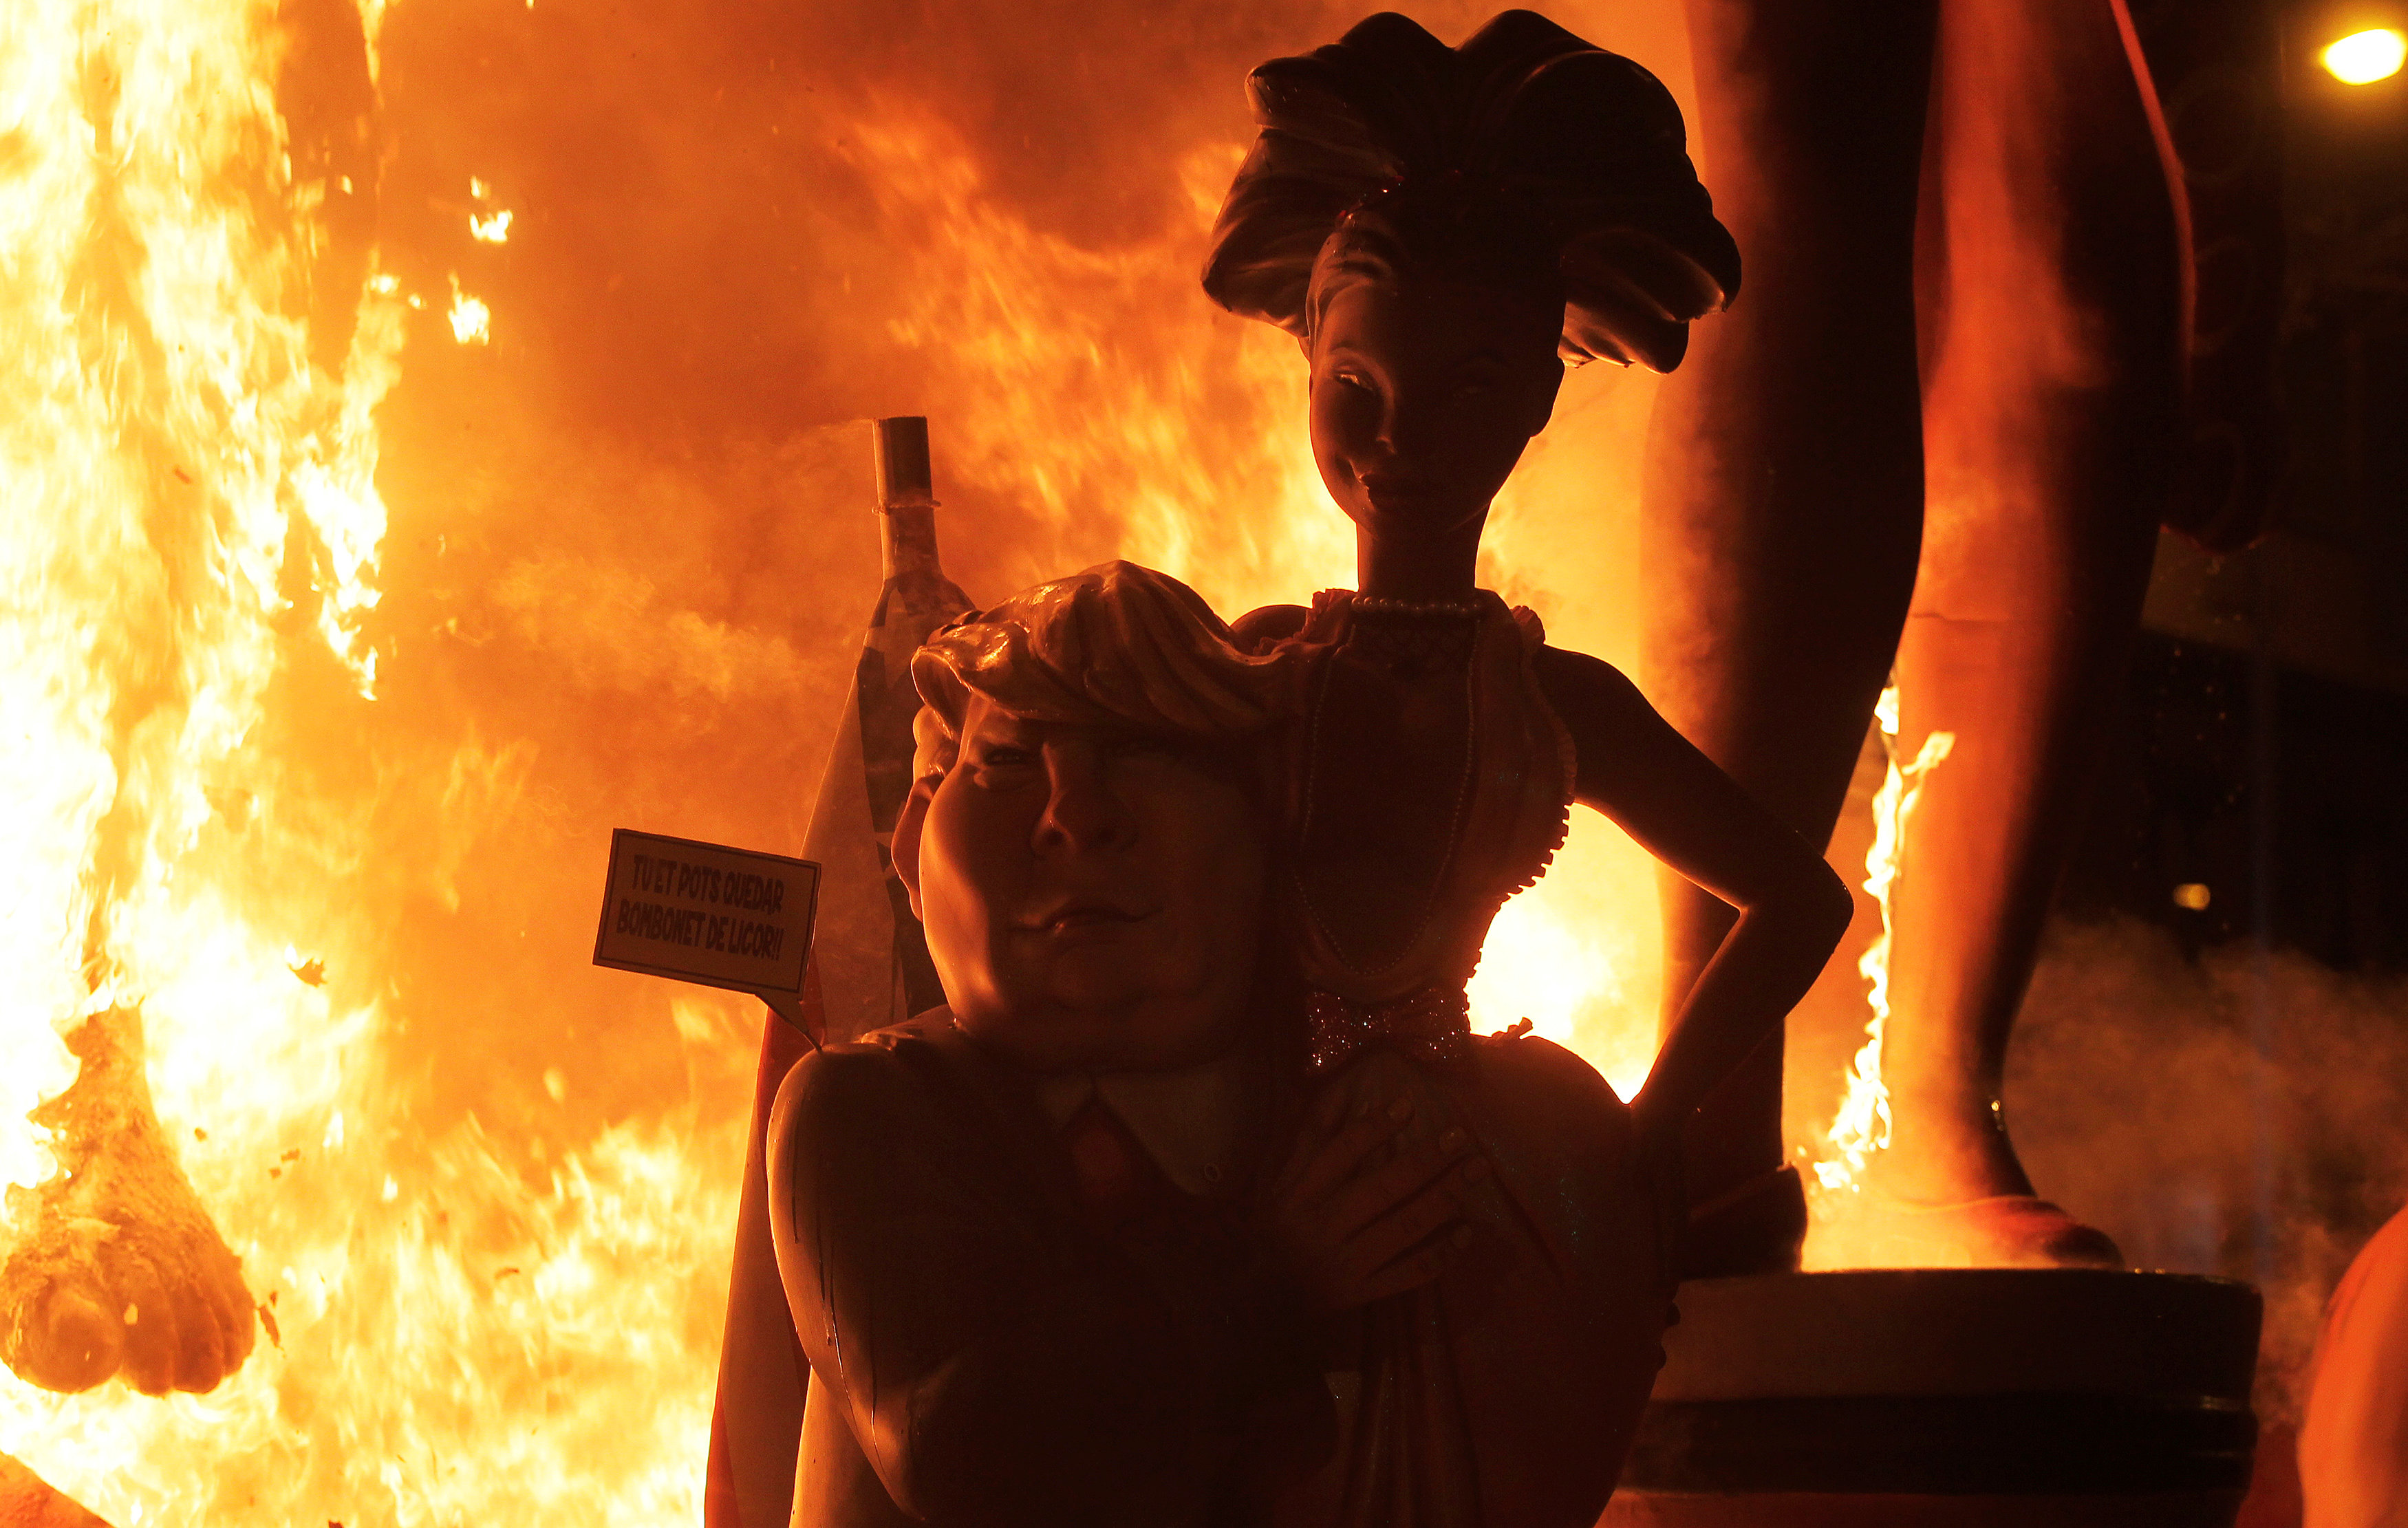 تمثال ترامب وخلفه النيران